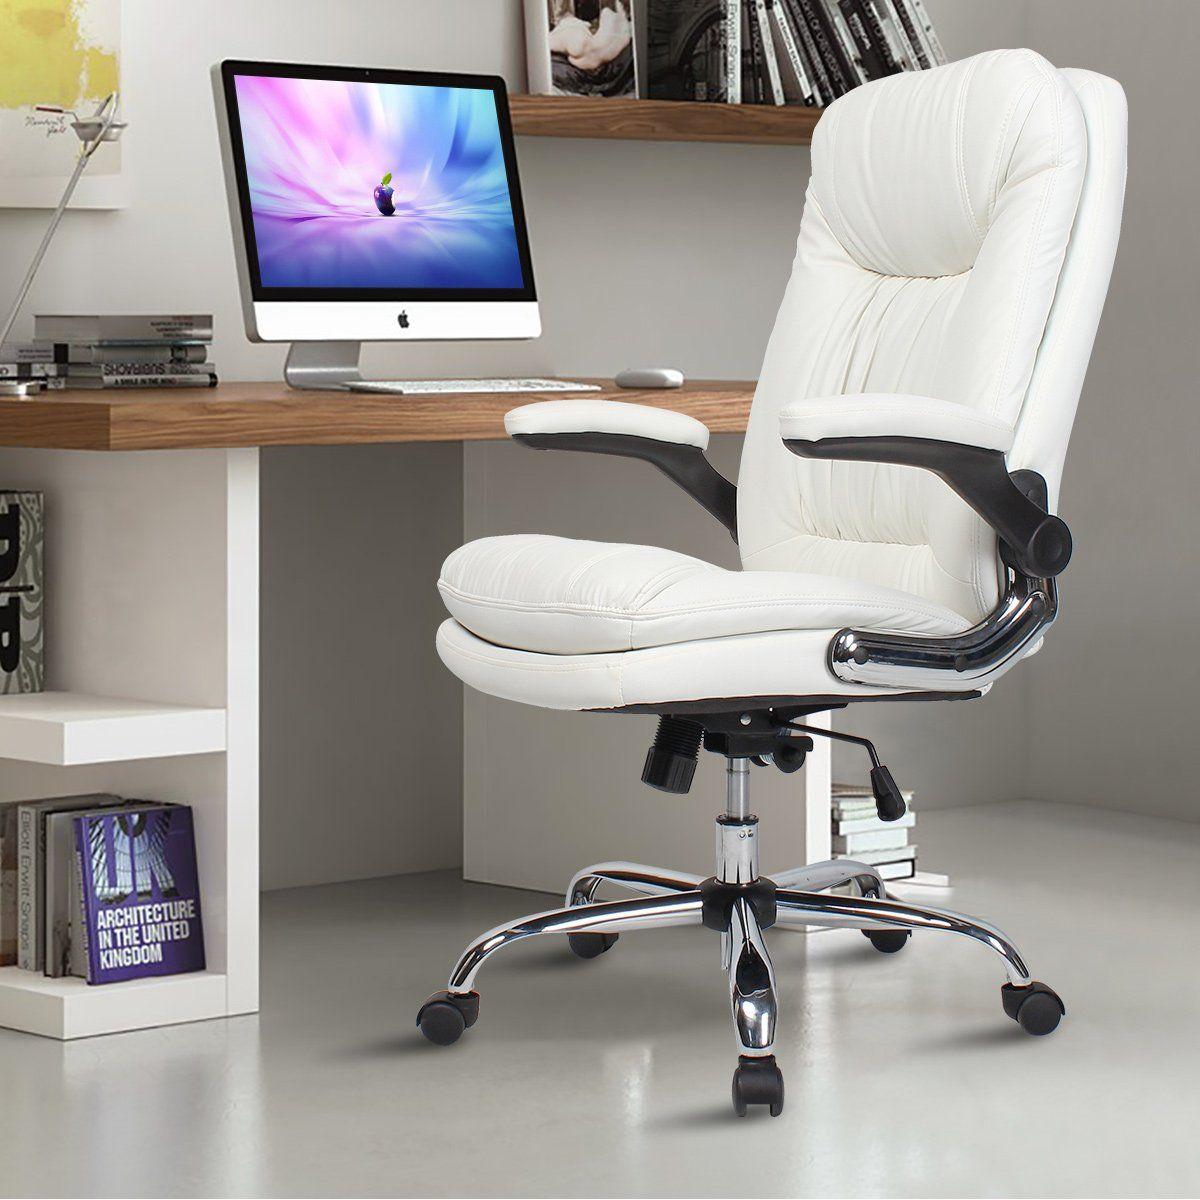 Office Chair In 2020 Best Office Chair Ergonomic Desk Chair Office Chair Design